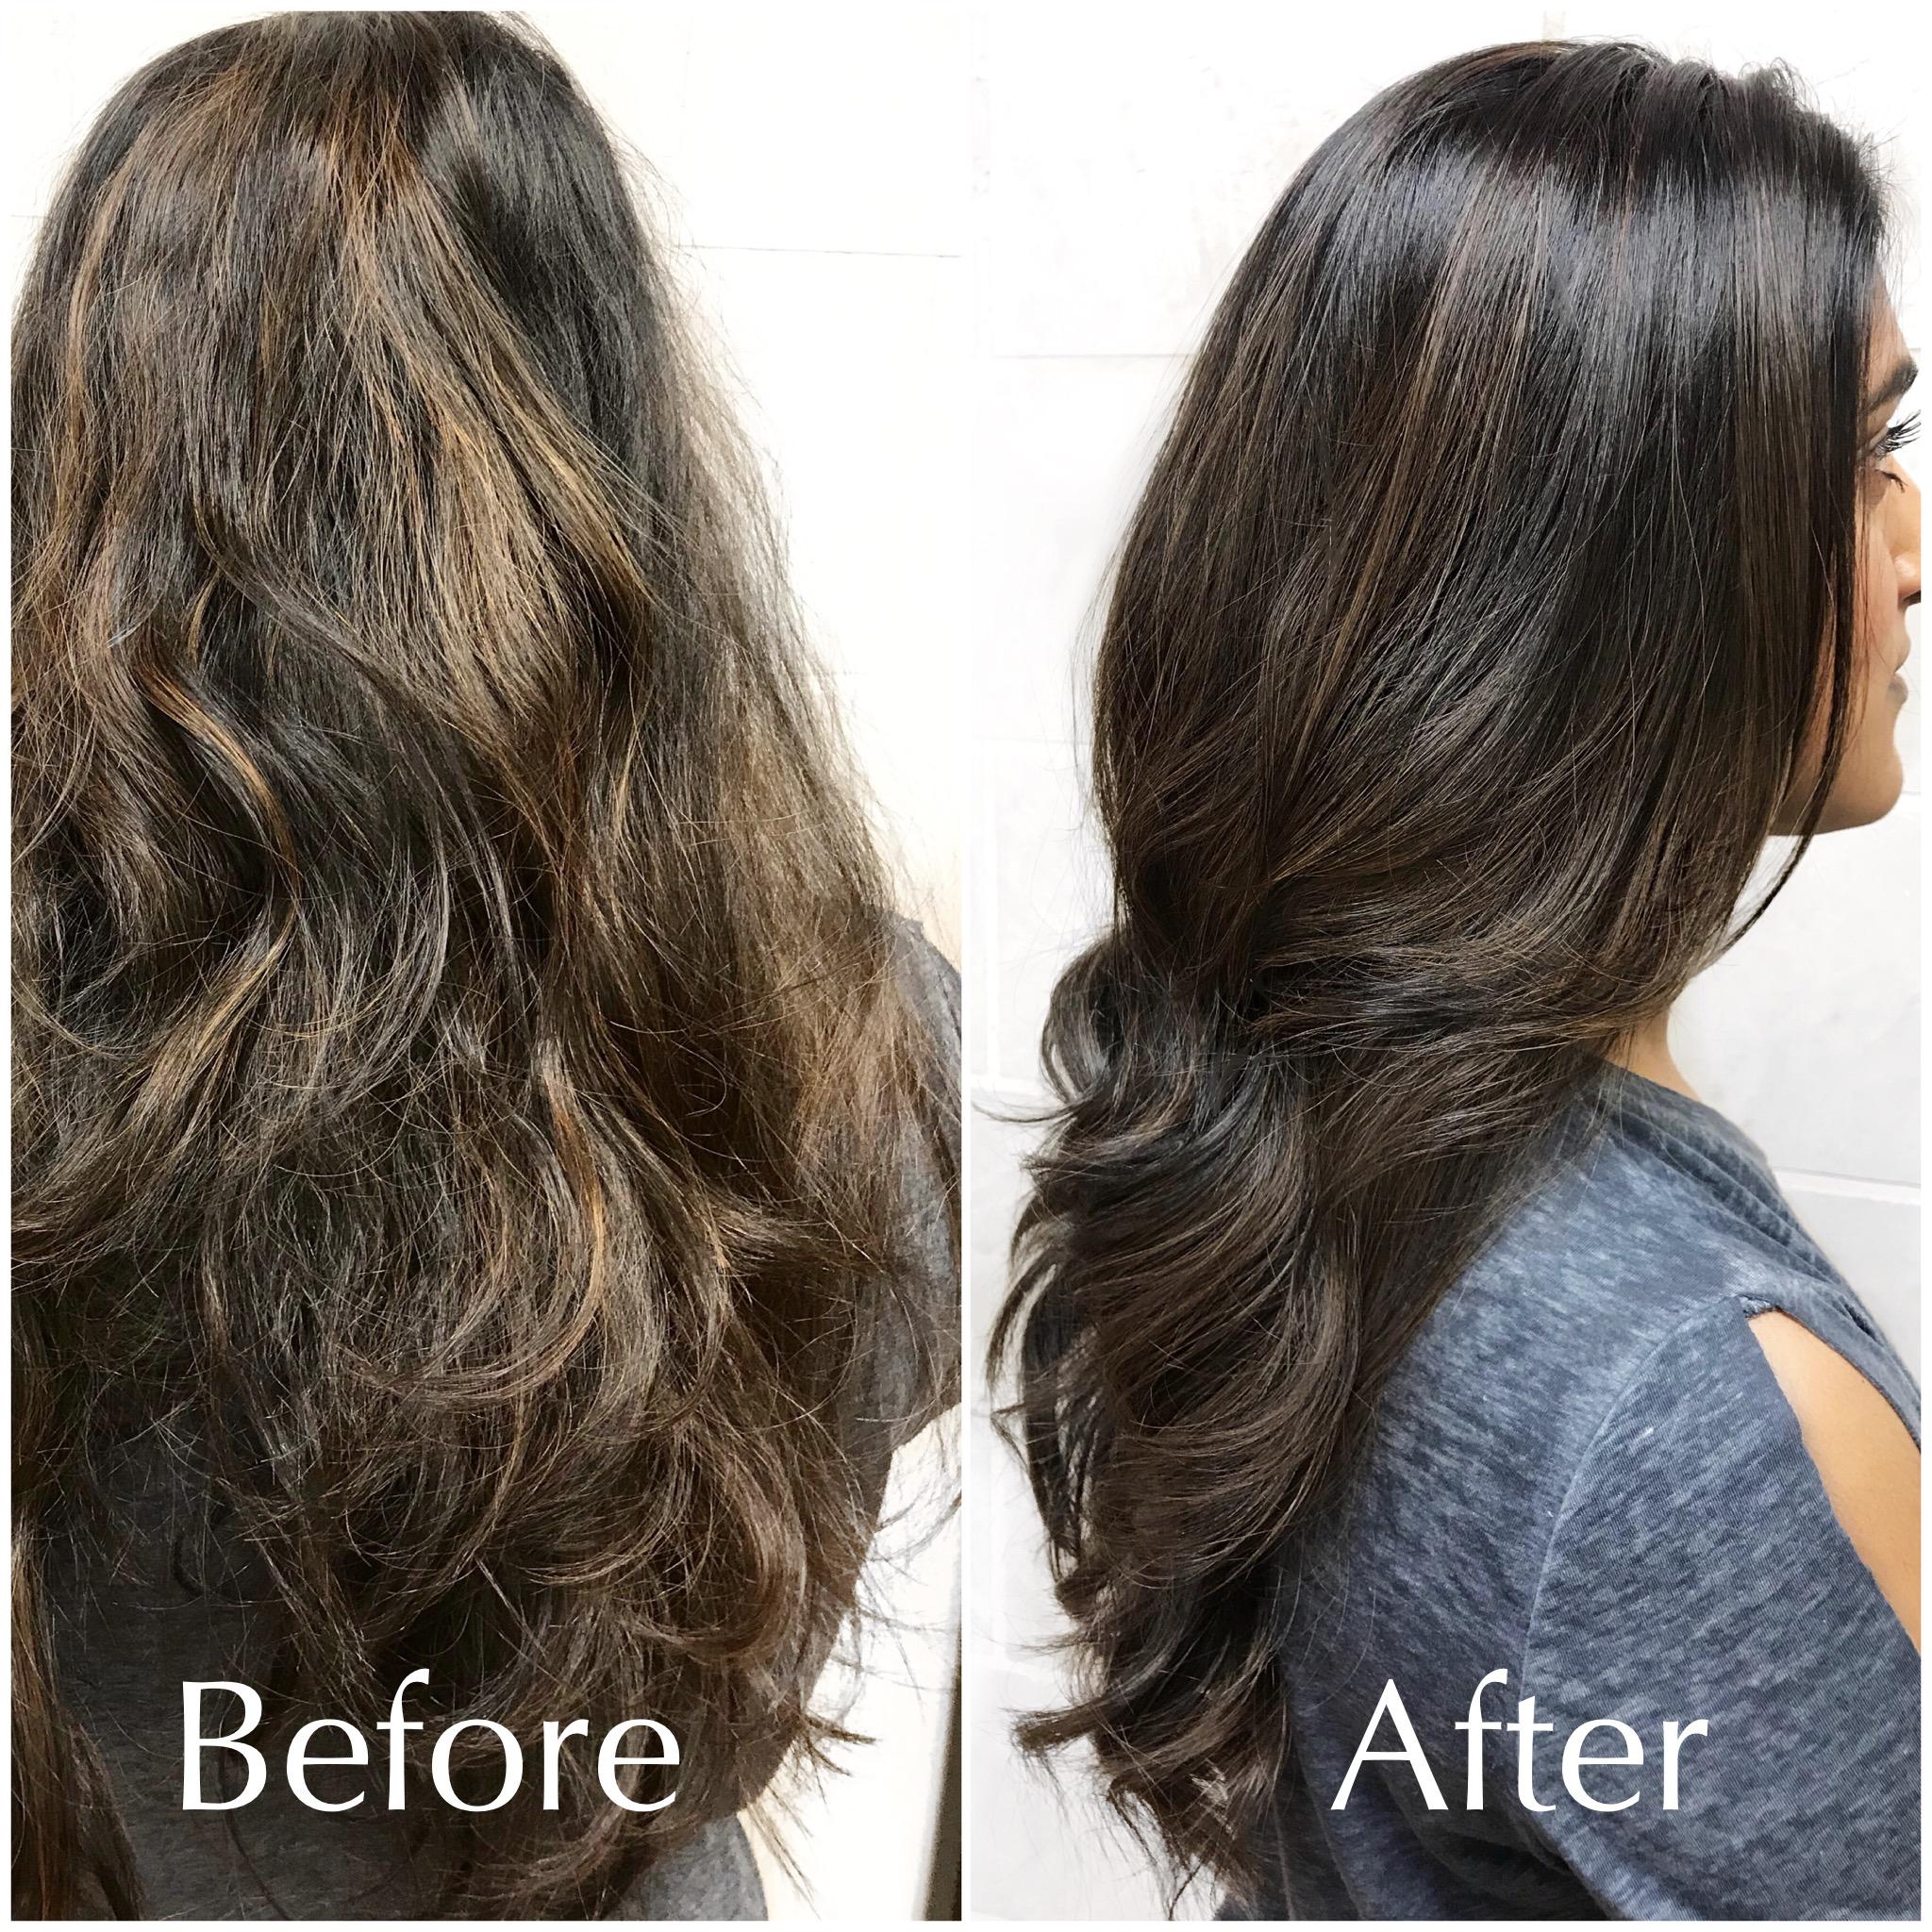 Best hair salon near me, best balayage Charlotte nc, top colorists in Charlotte nc, best hair colorist near me, color correction specialist near me, asian hair specialist near me